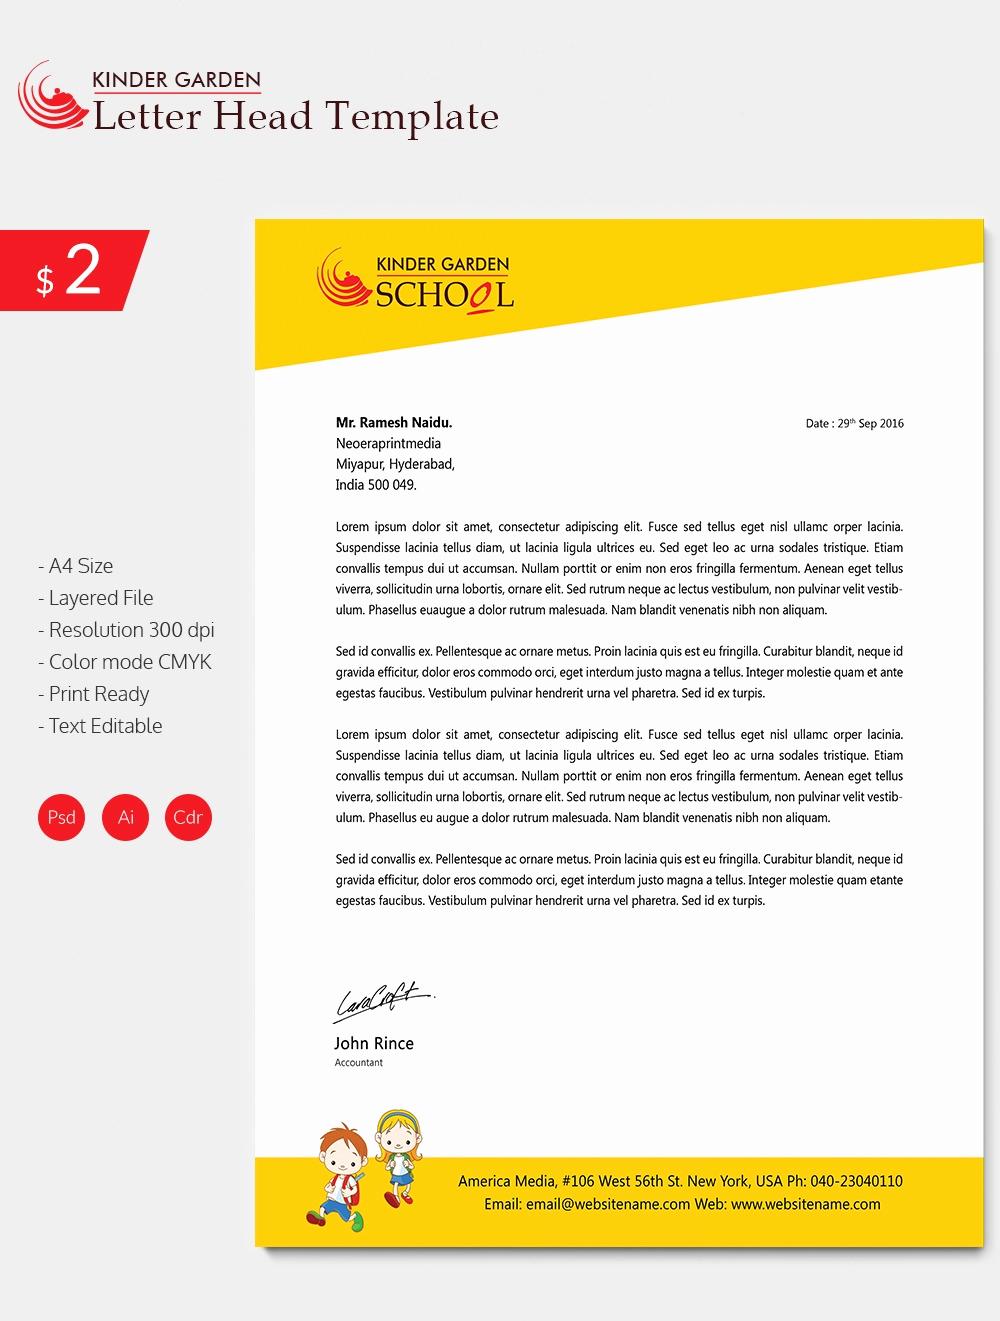 Sample Of Business Letterhead Best Of 25 Letterhead Design Templates Free Psd Ai Word